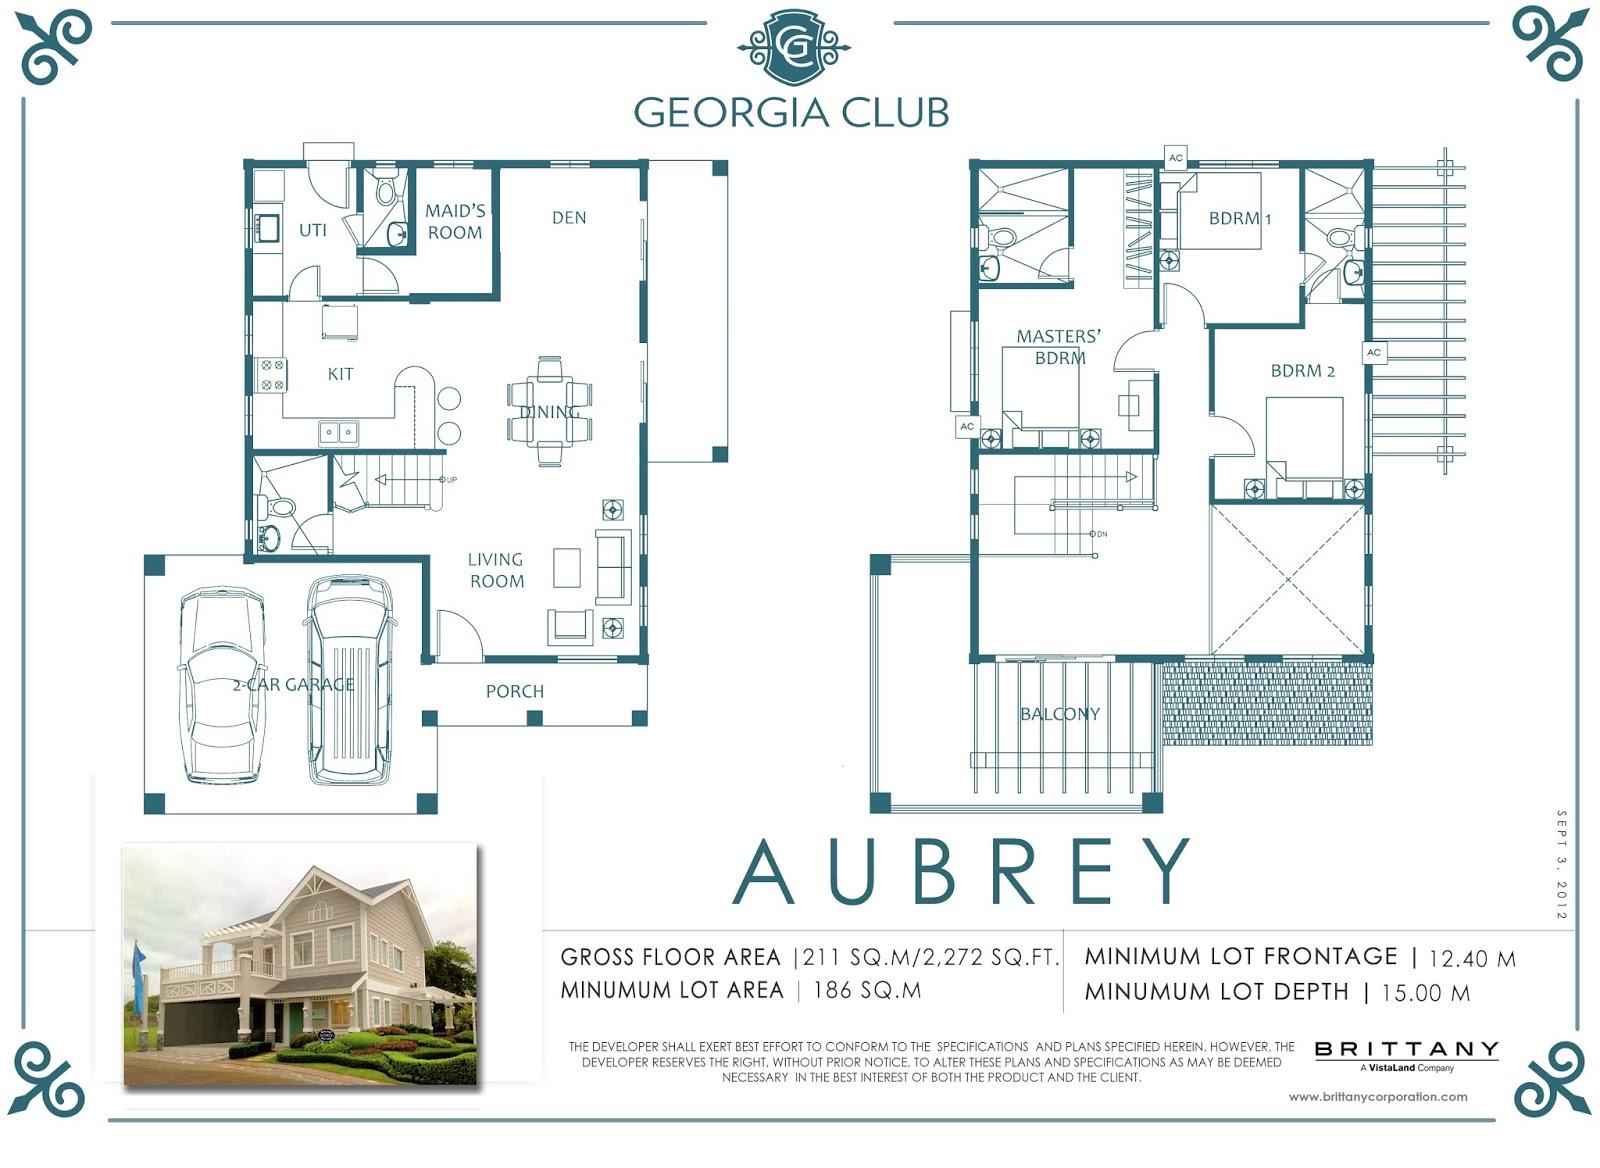 GEORGIA CLUB - AUBREY | Luxury House for Sale Sta. Rosa Laguna on